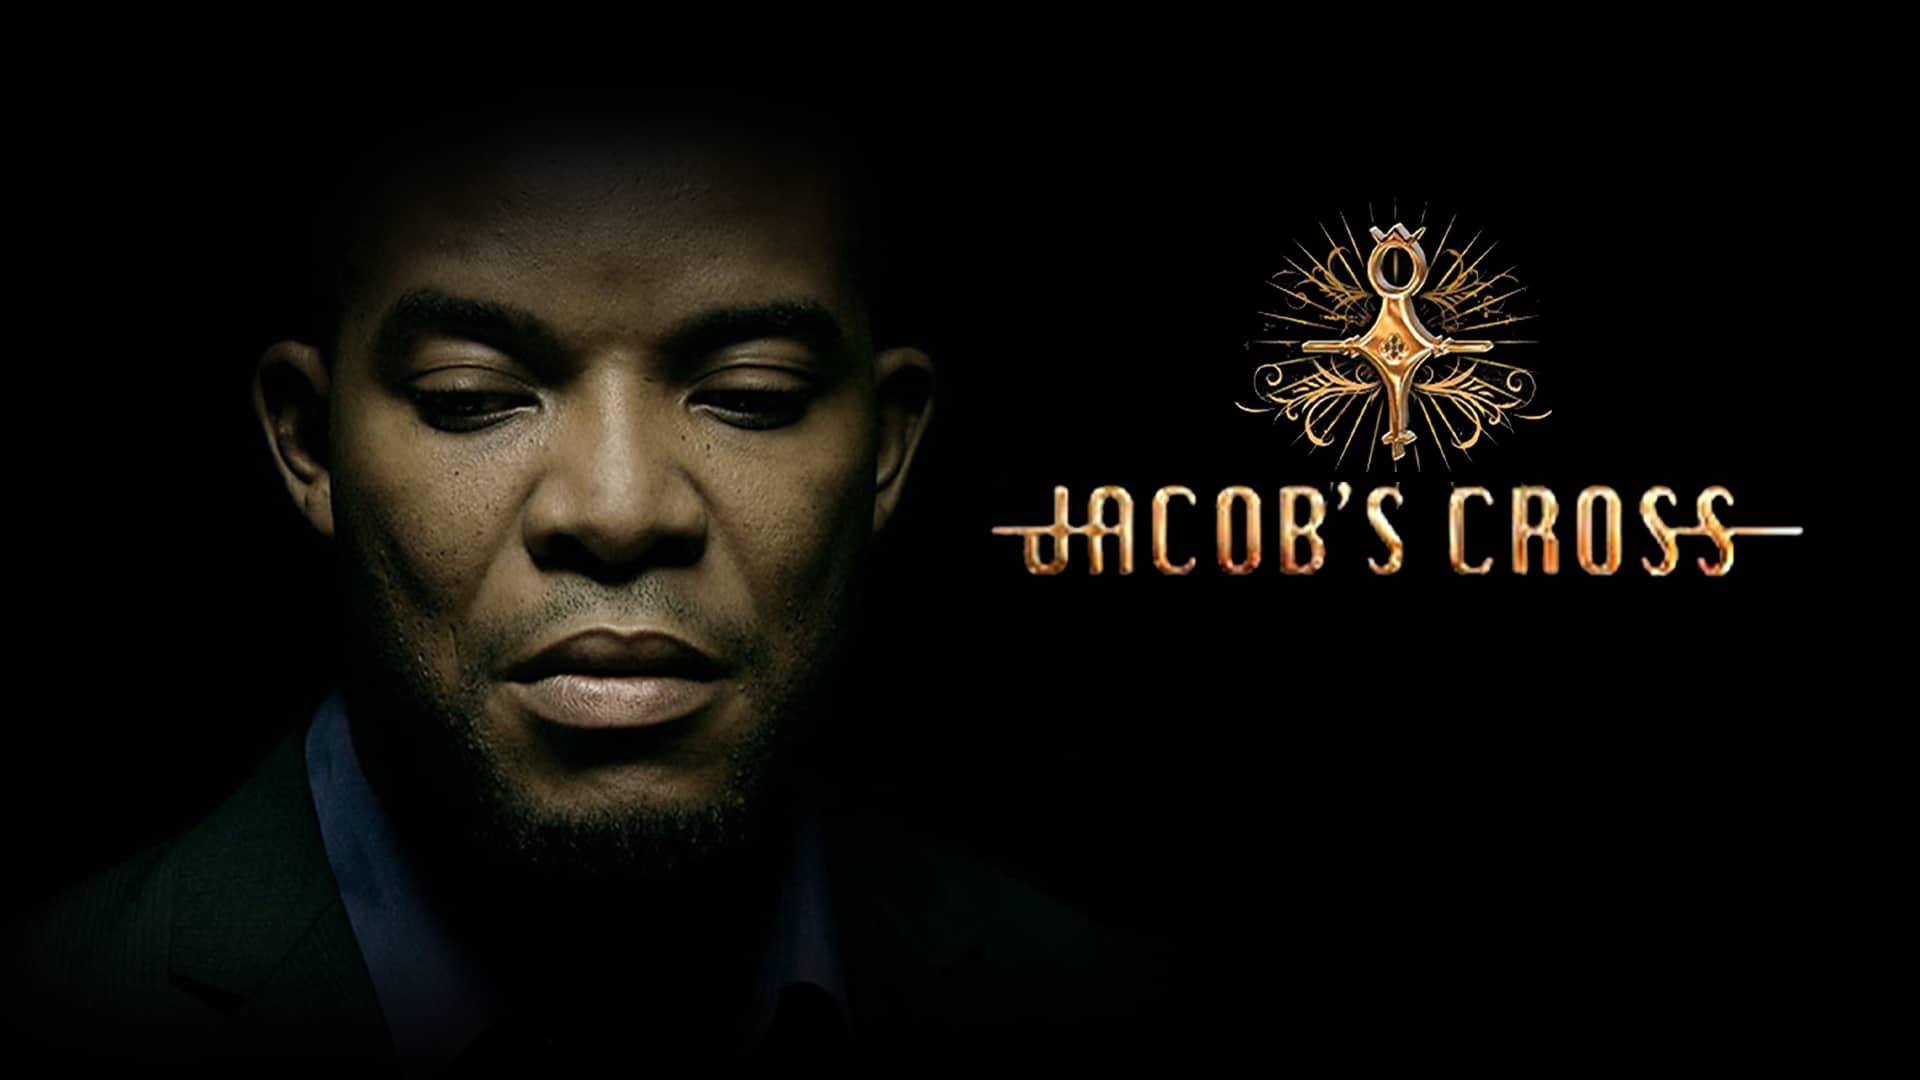 Jacobs Cross Poster 1920x1080 16x9 1